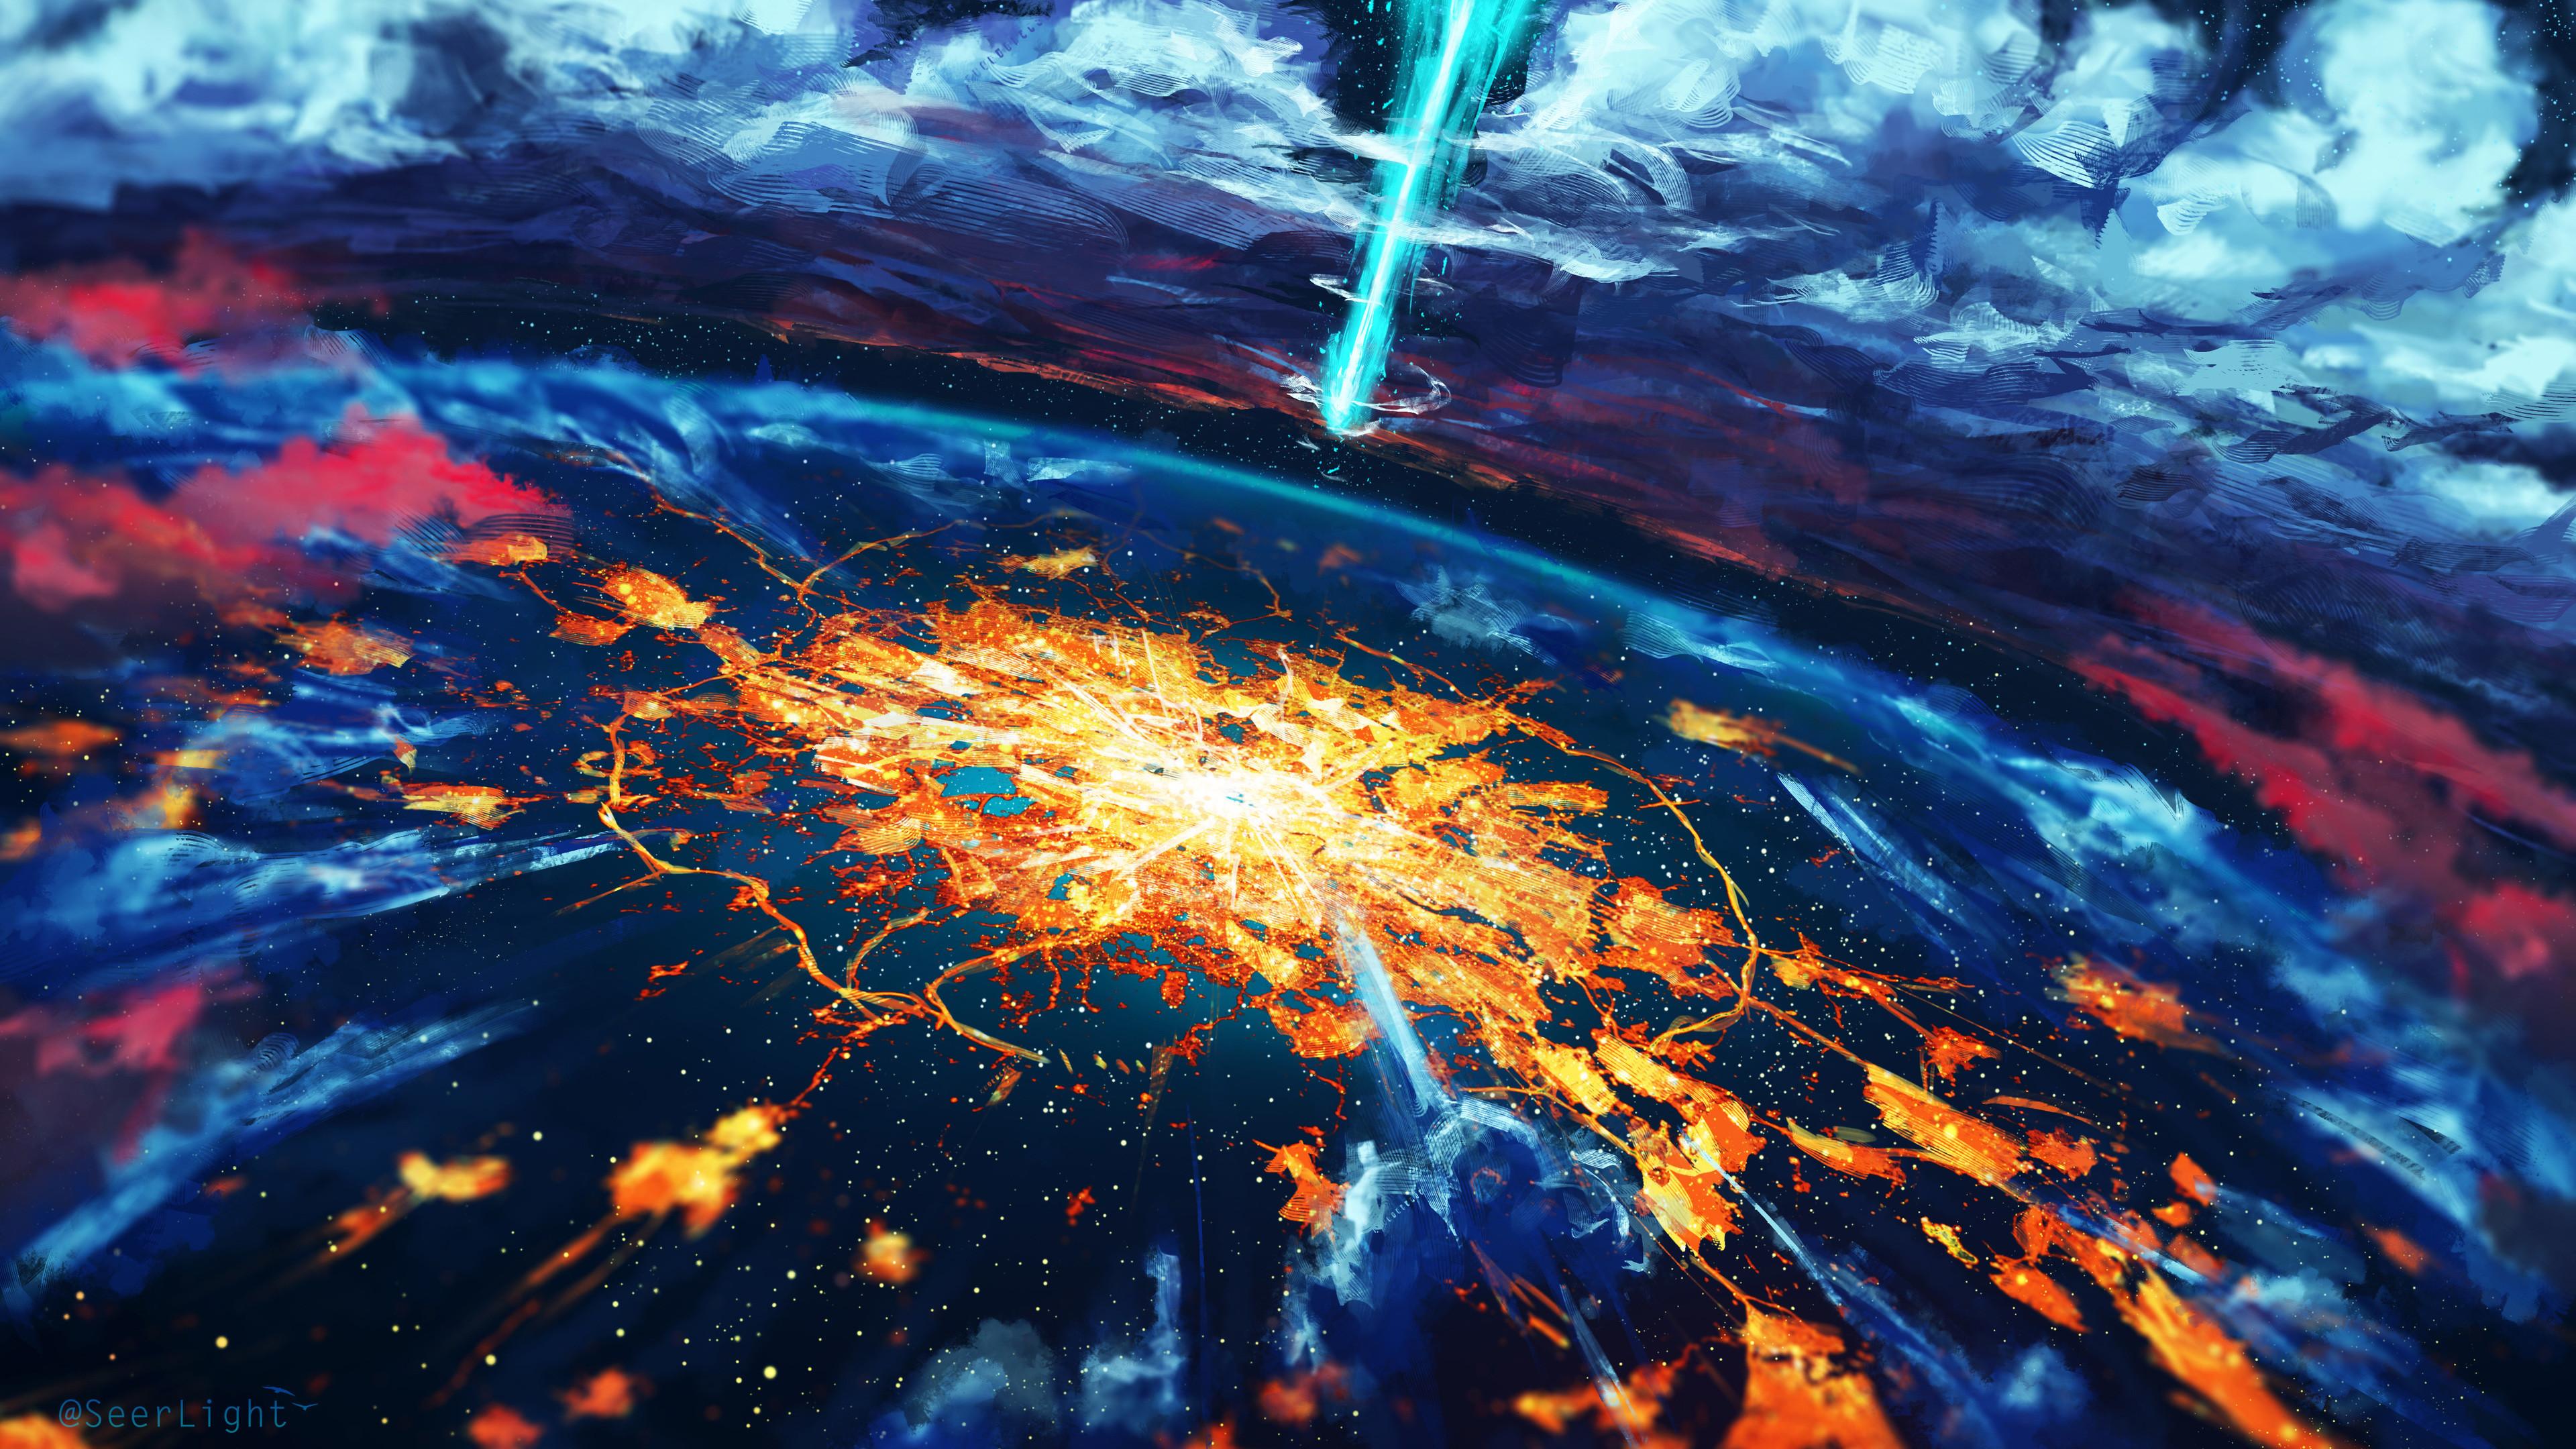 Res: 3840x2160, Apocalypse Cosmos Disaster Explosion World 4k